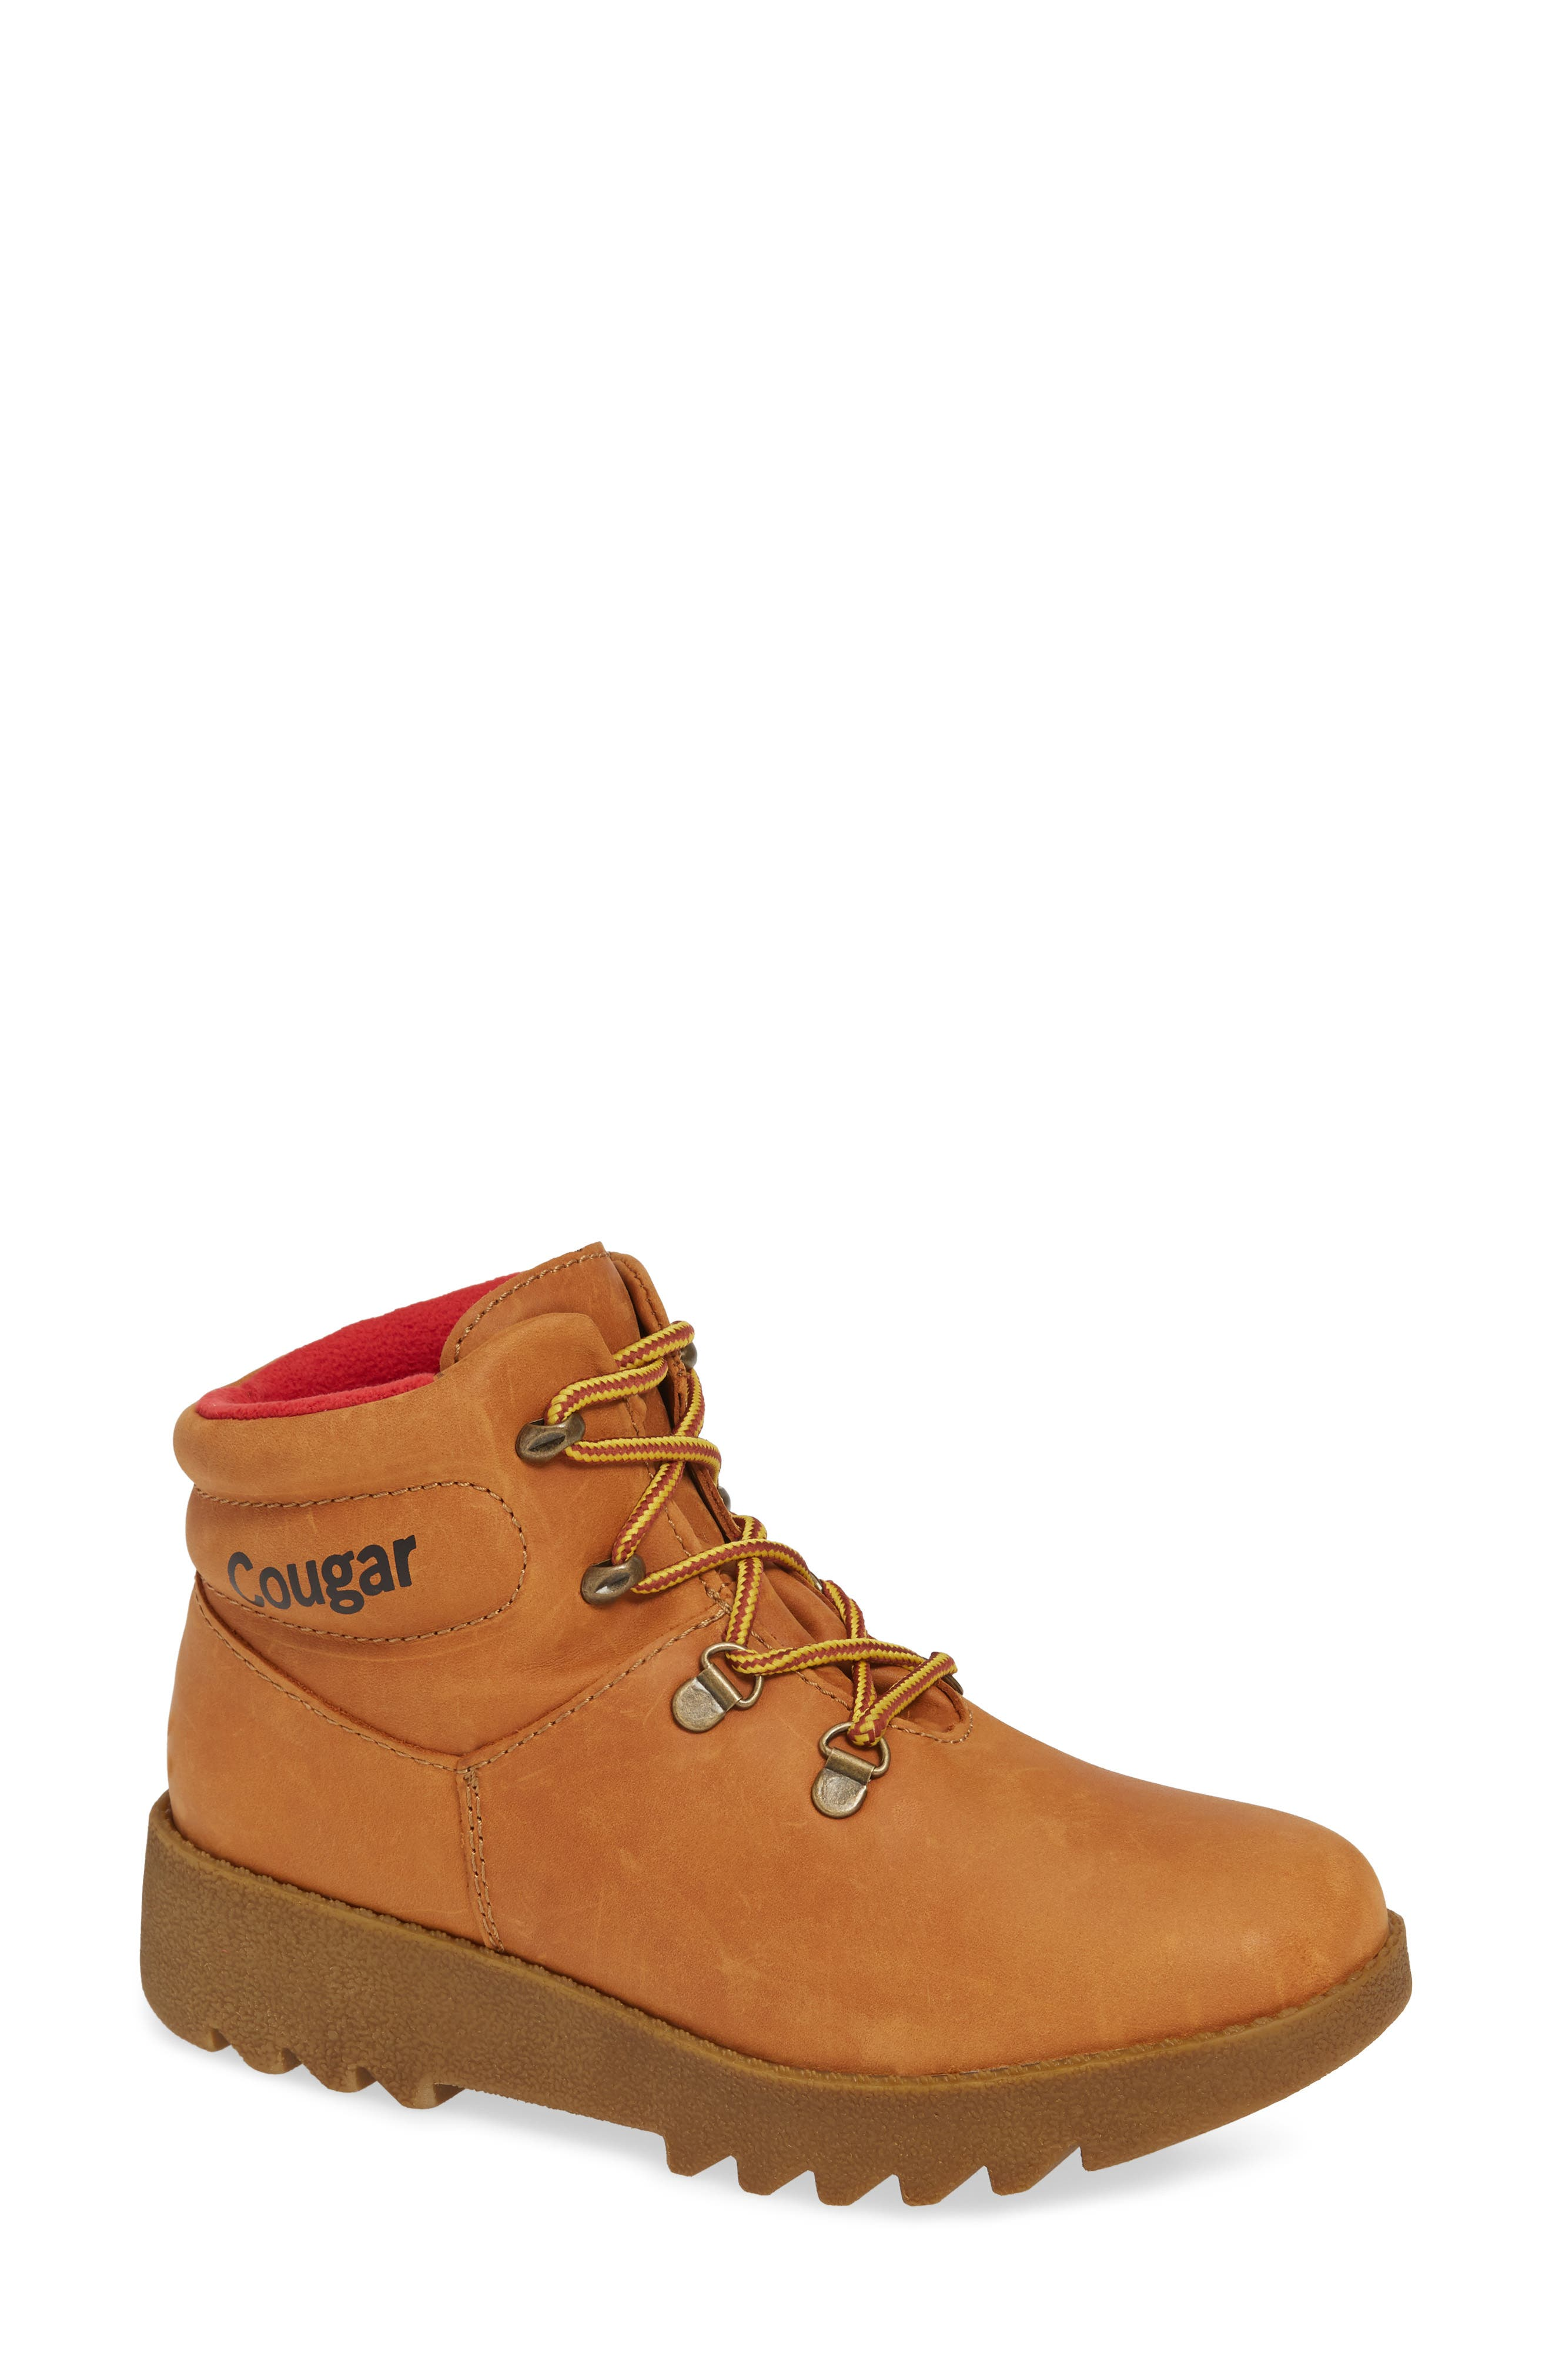 61f7942d0f90 Women s Cougar Boots